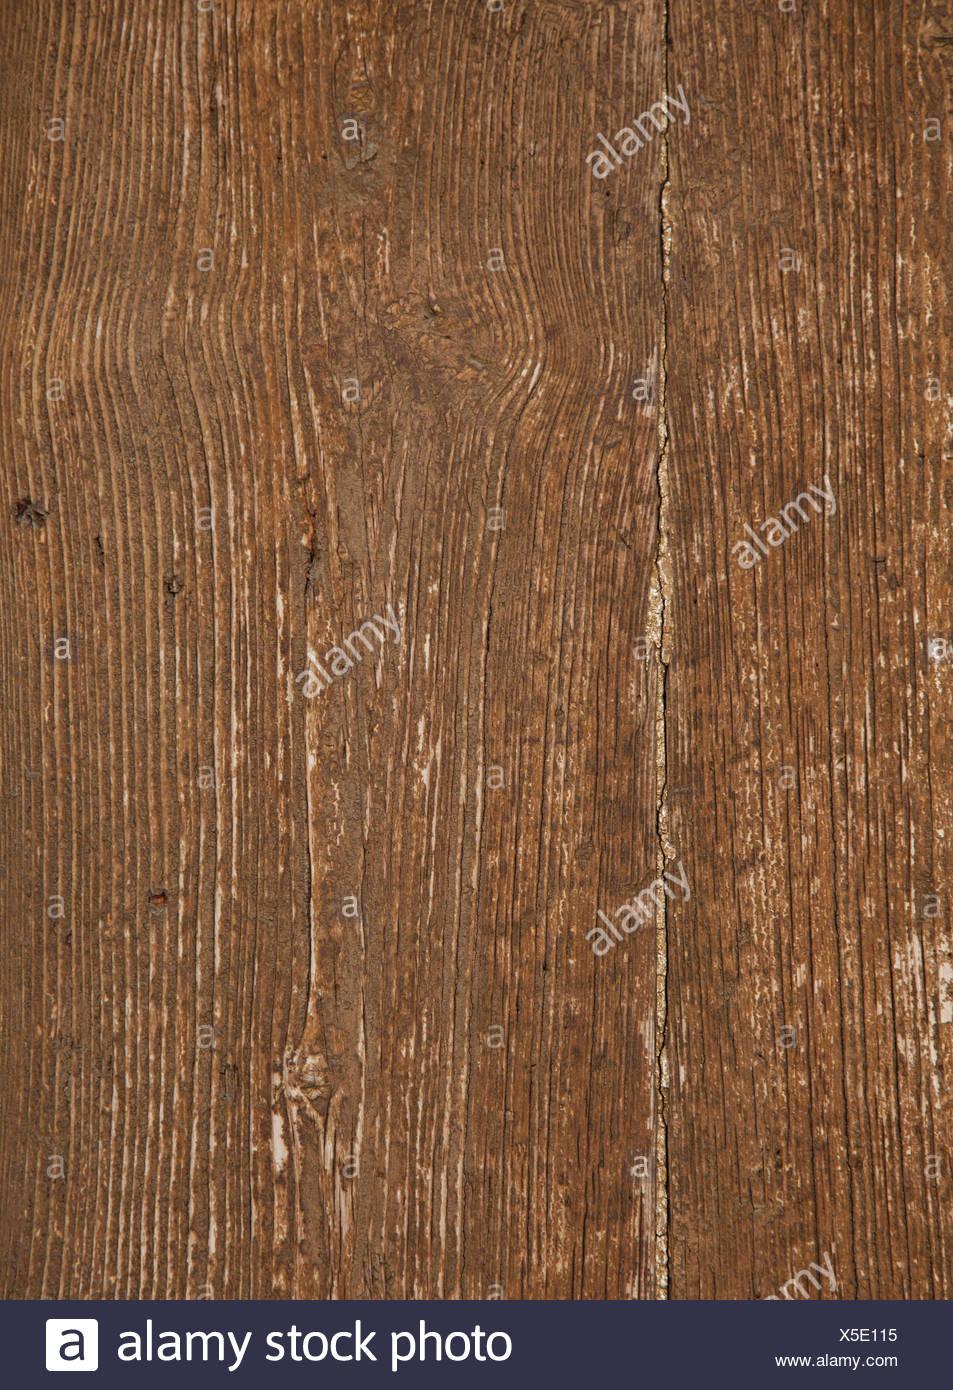 Weathered wood - Stock Image